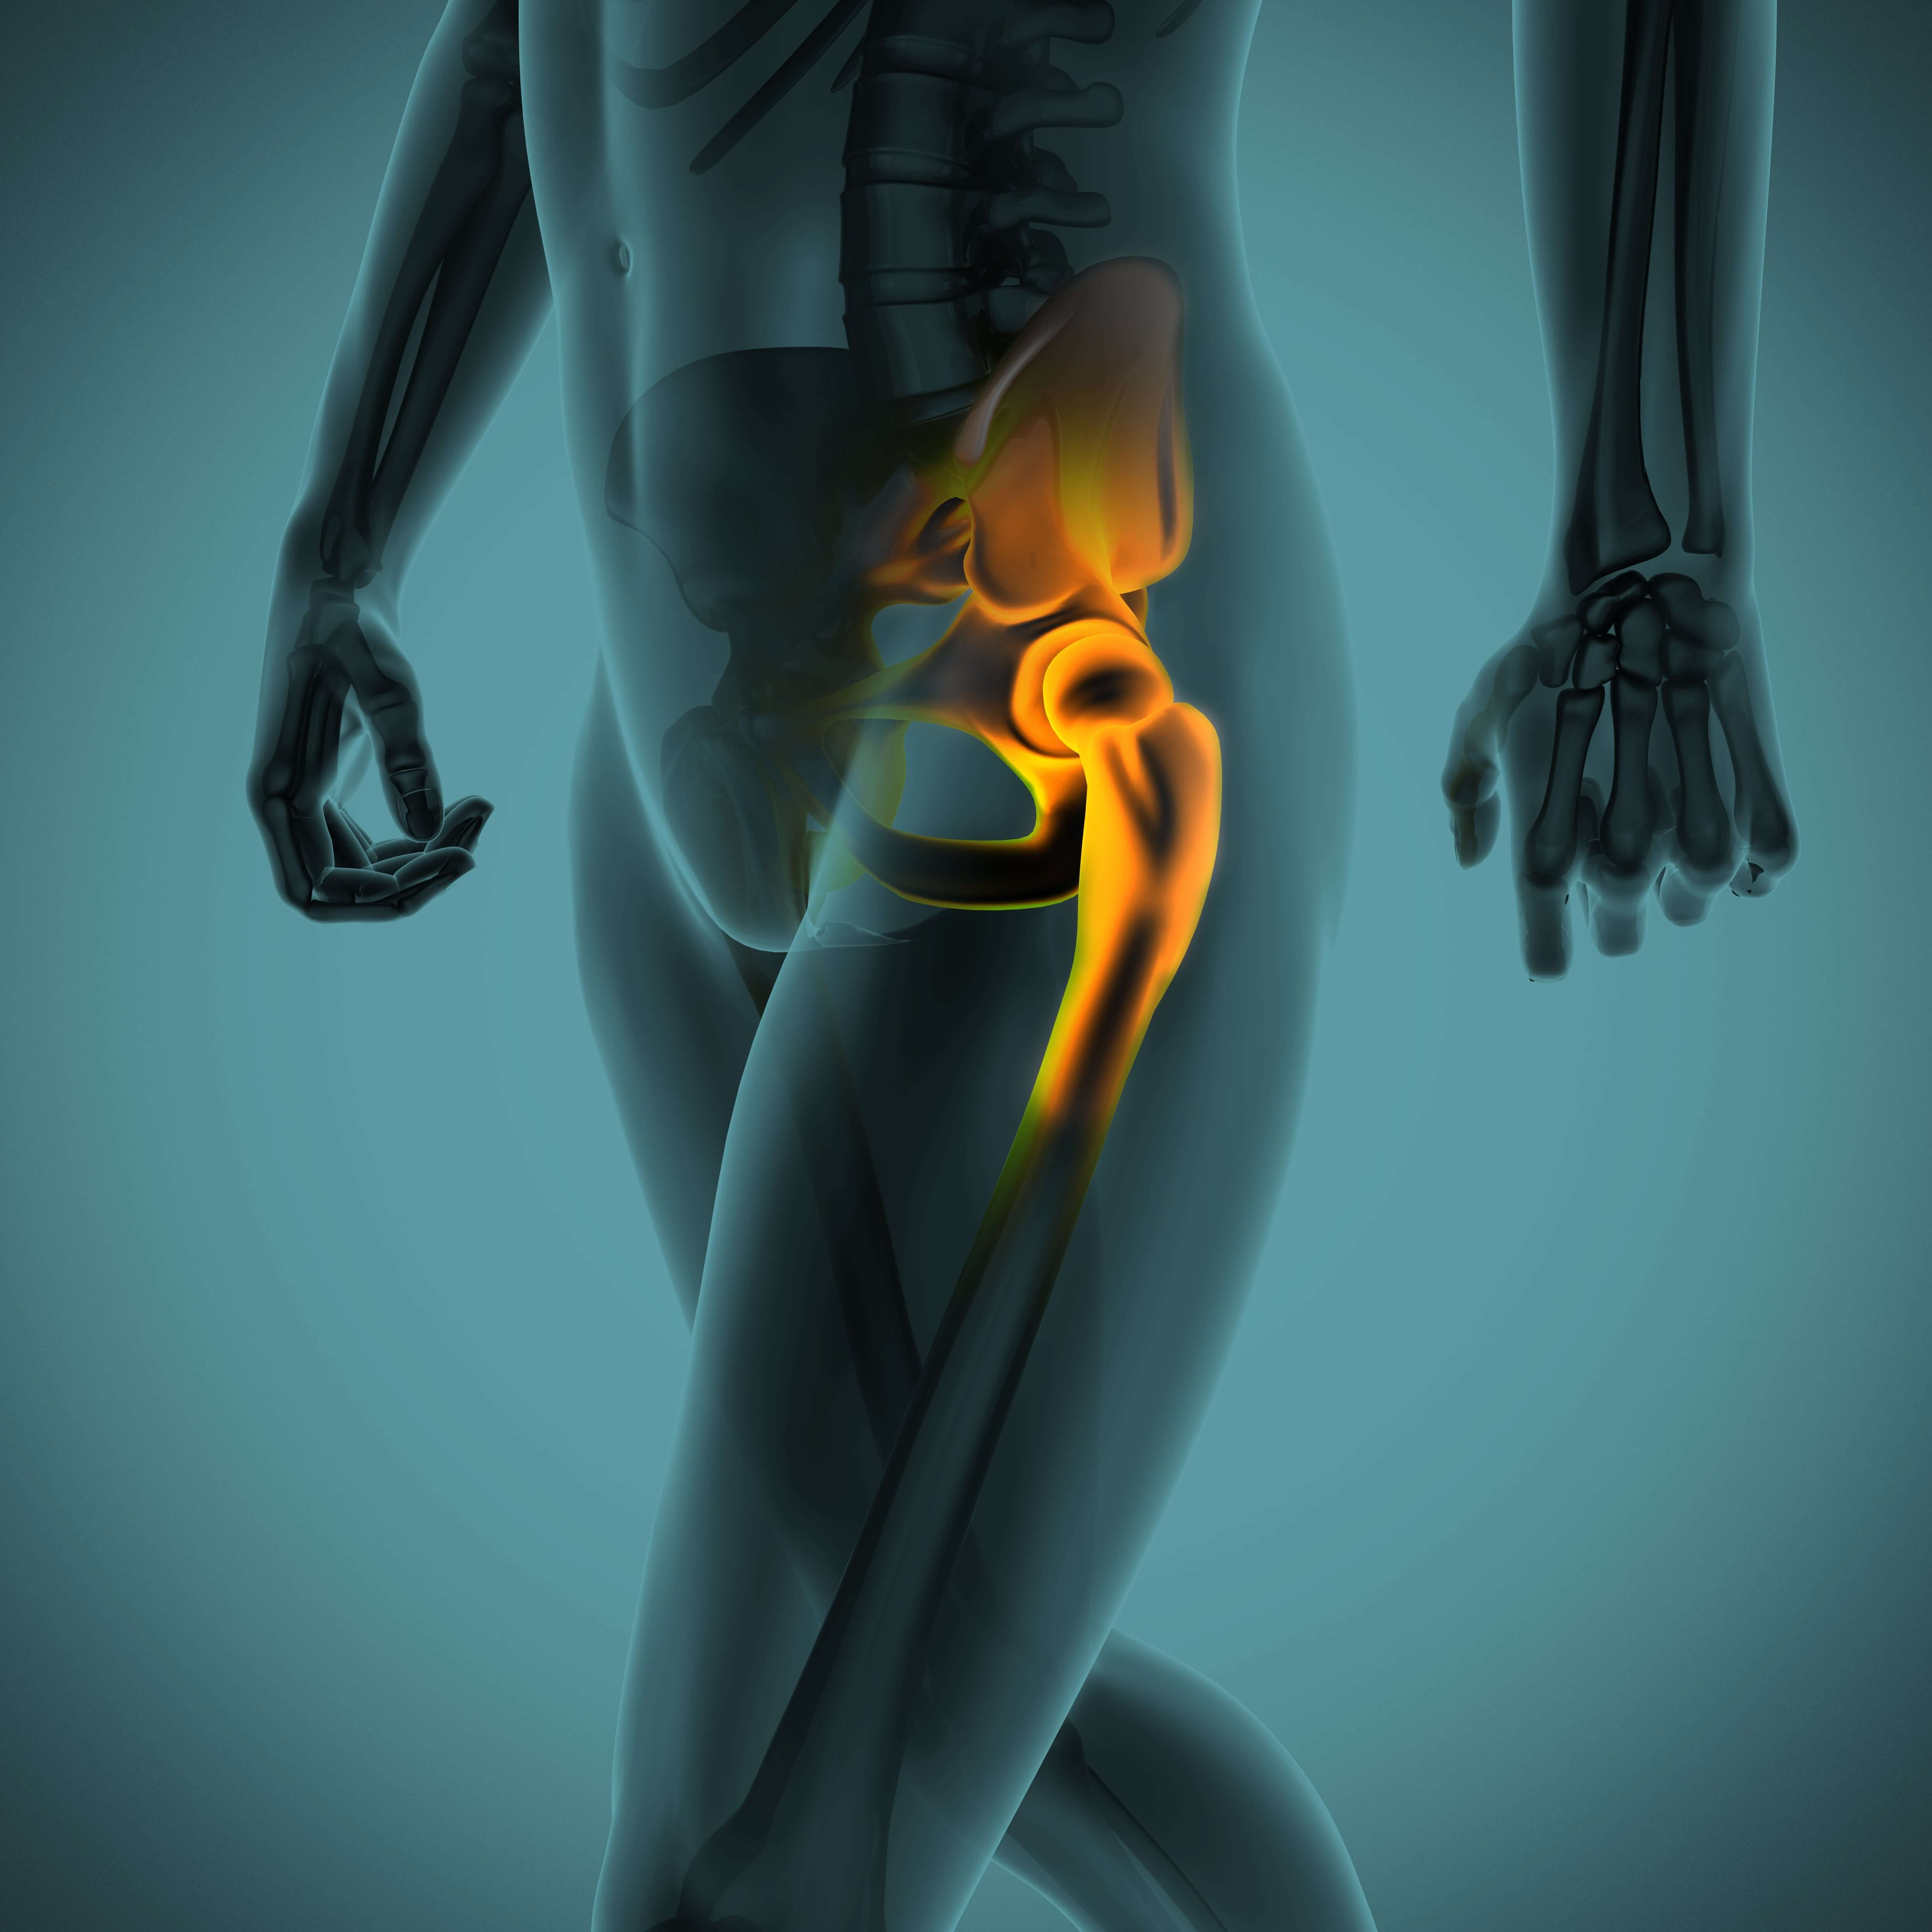 Hip Arthroplasty Surgery Image